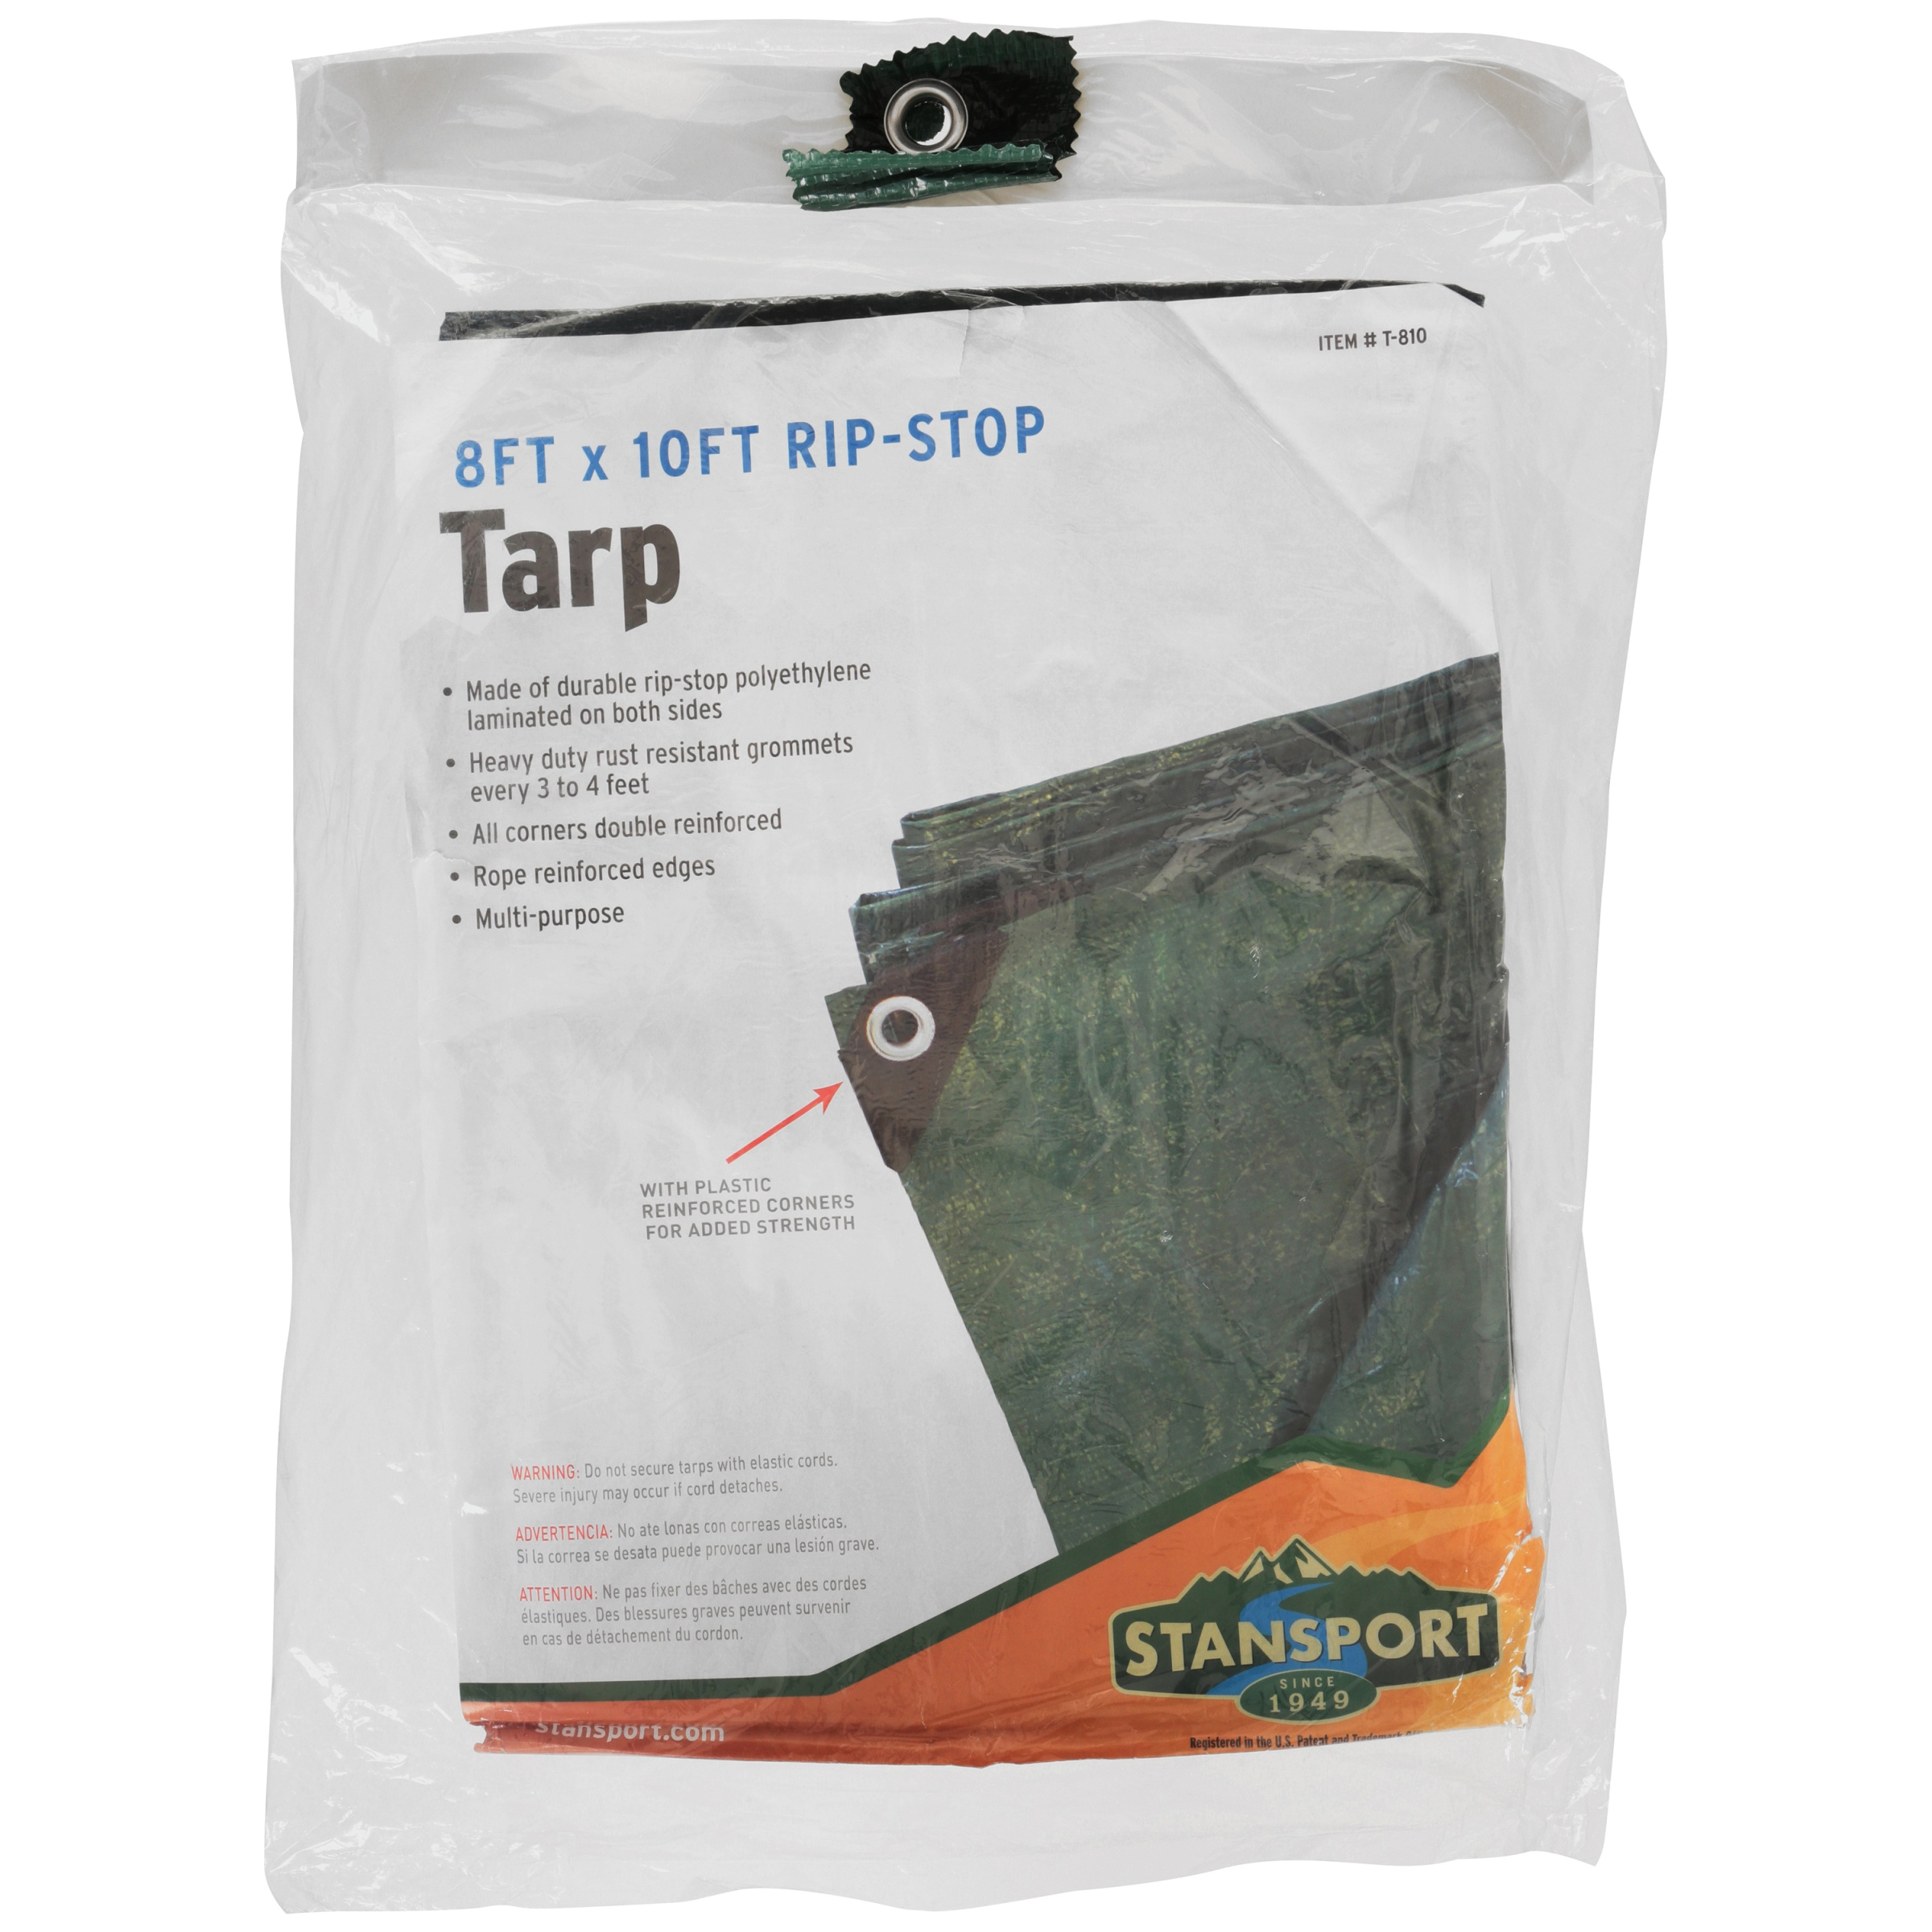 Stansport Reinforced Brown Rip-Stop Tarp